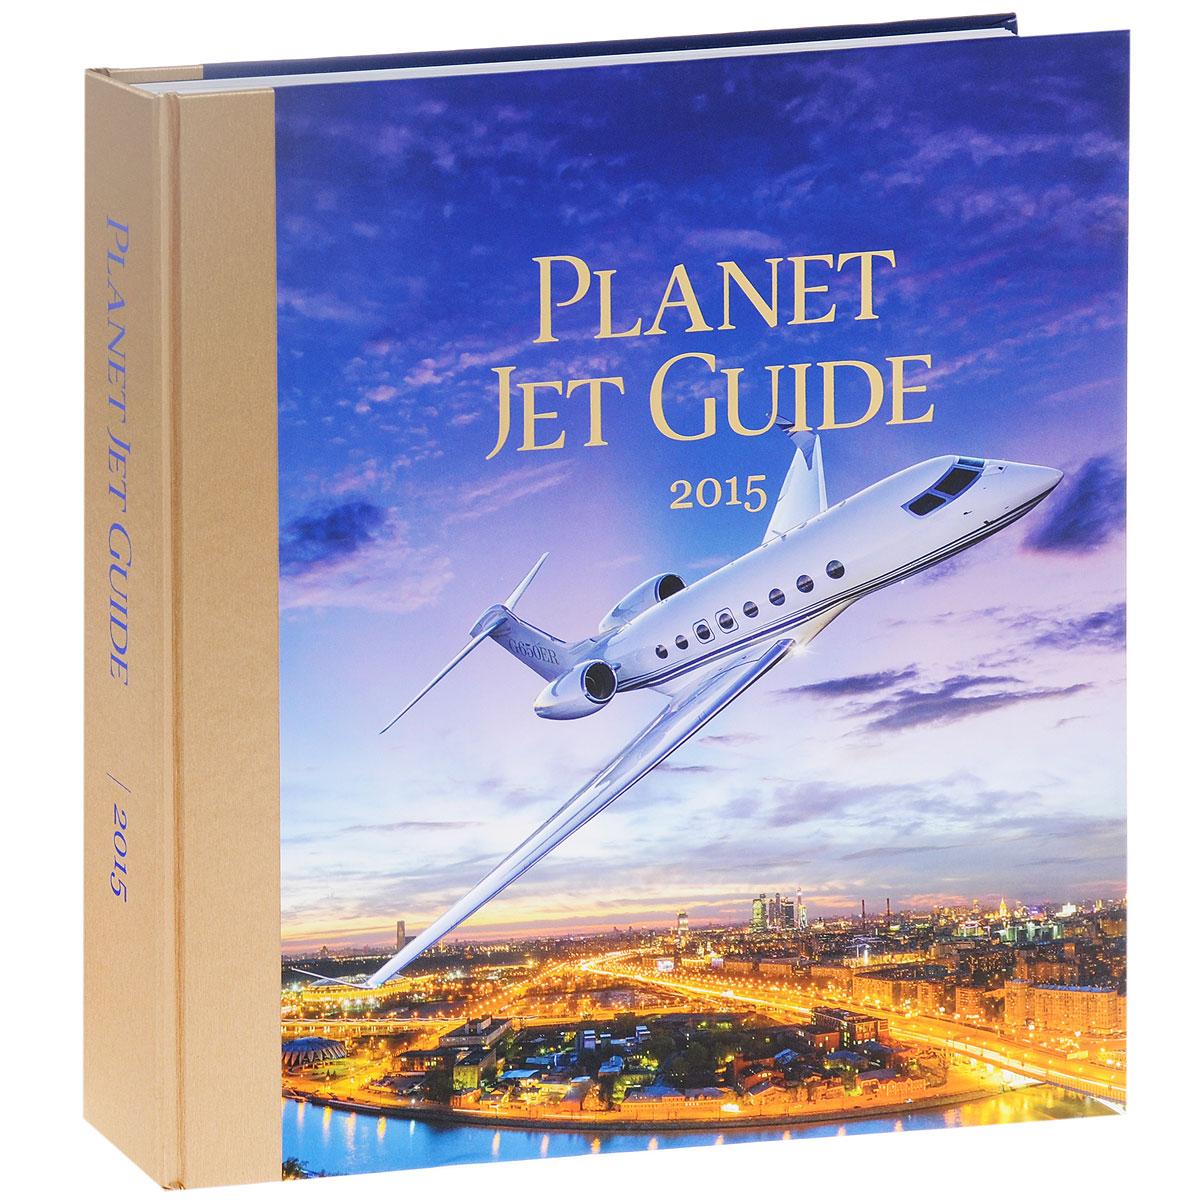 Planet Jet Guide 2015. Каталог самолетов и вертолетов бизнес-авиации